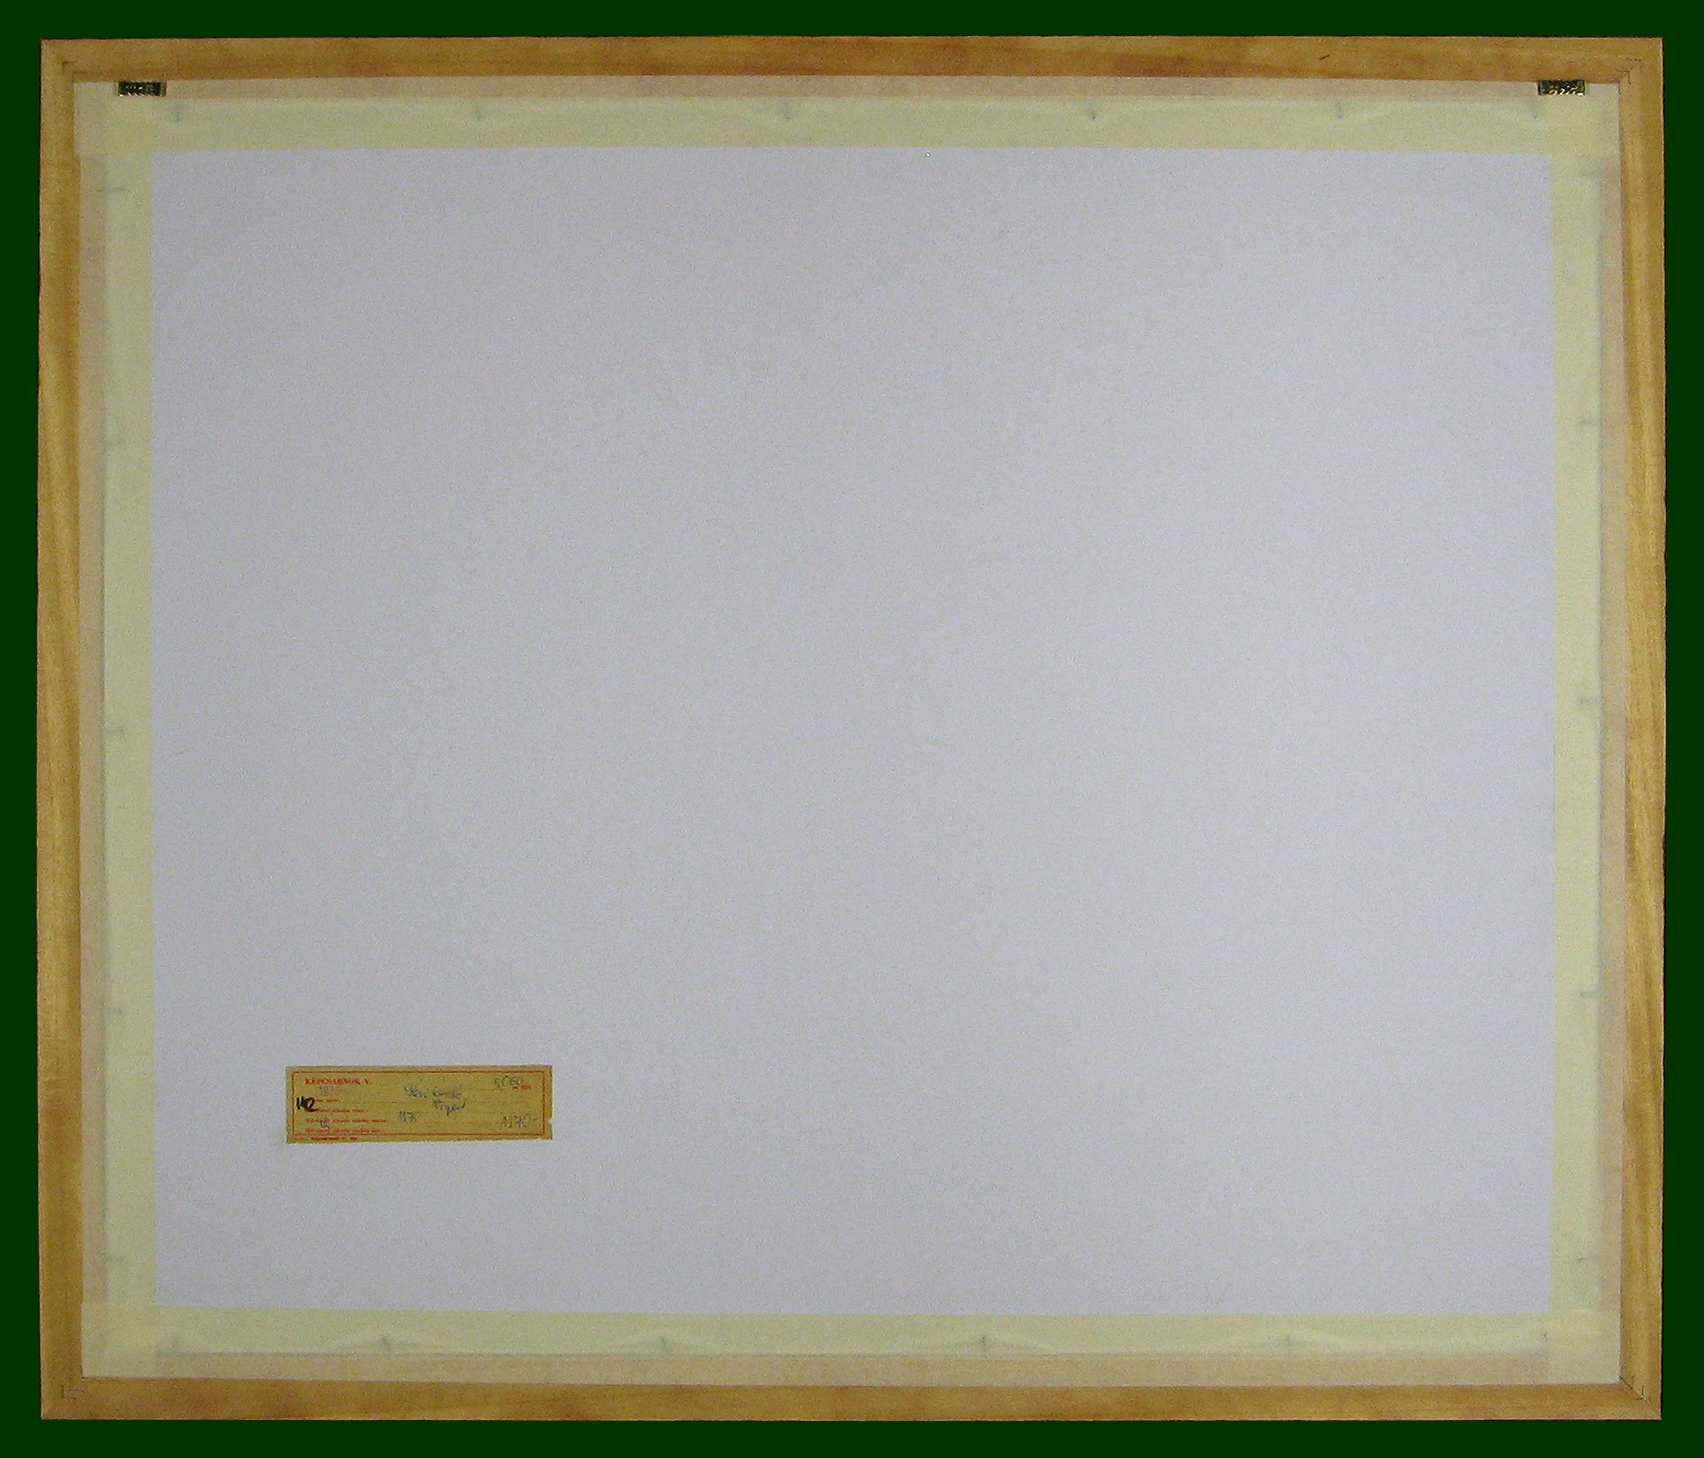 12-12h_t.jpg (1704×1458)